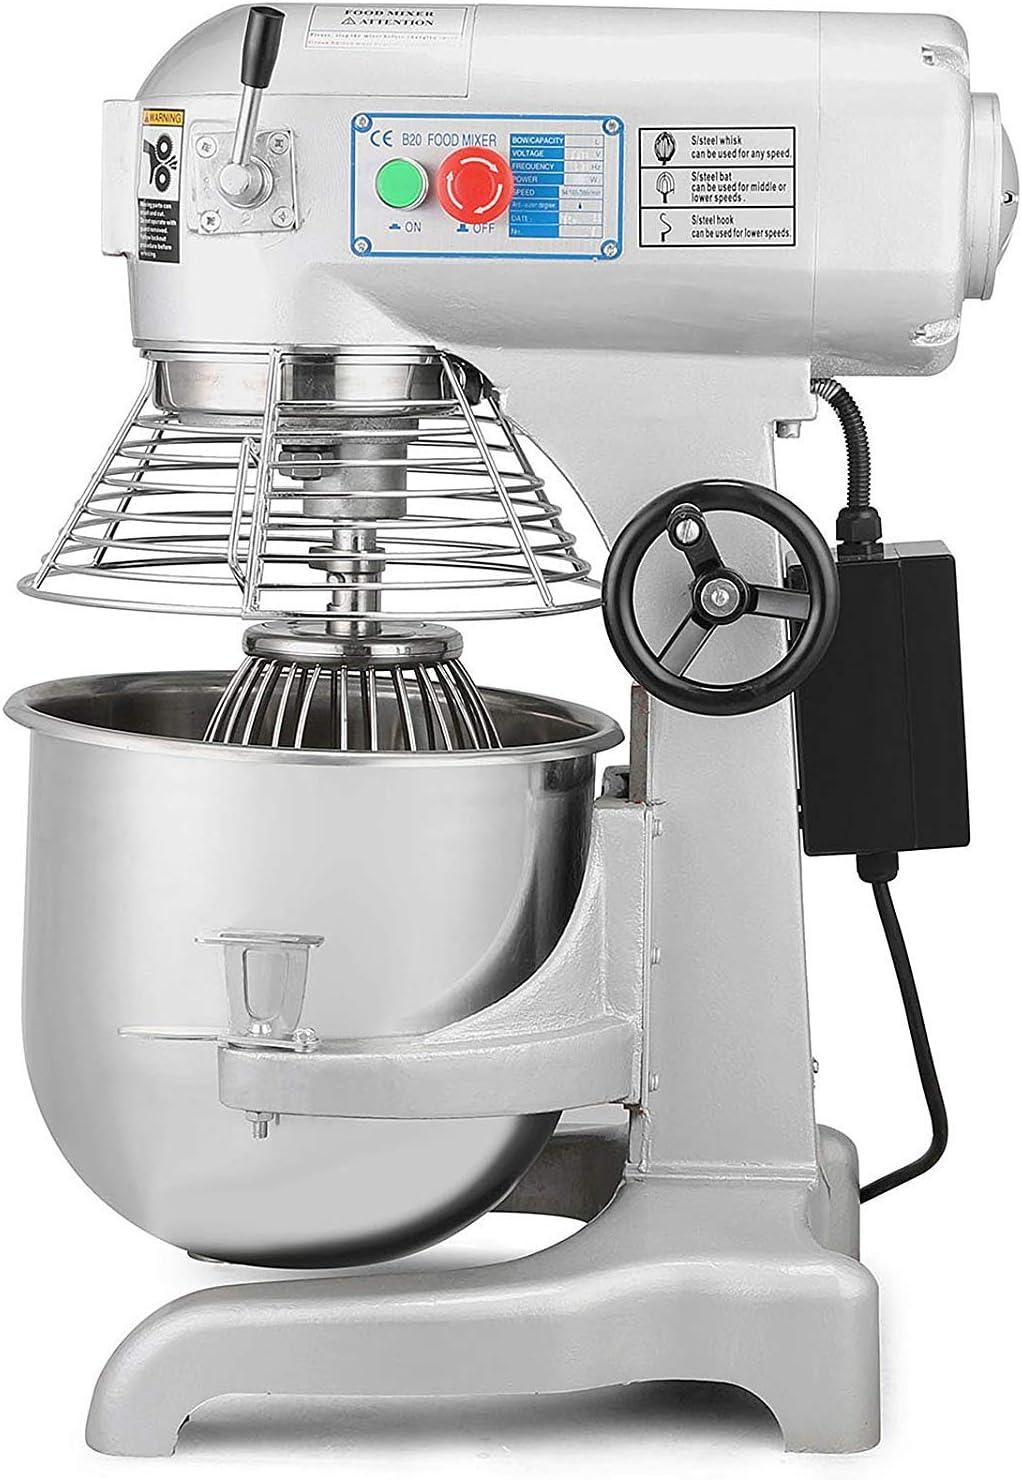 ZGYQGOO Commercial Food Mixer Machine Stand Mixer 30 Quart 1100W Electric Dough Mixer with 3 Agitator Attachments Commercial Grade (30L)